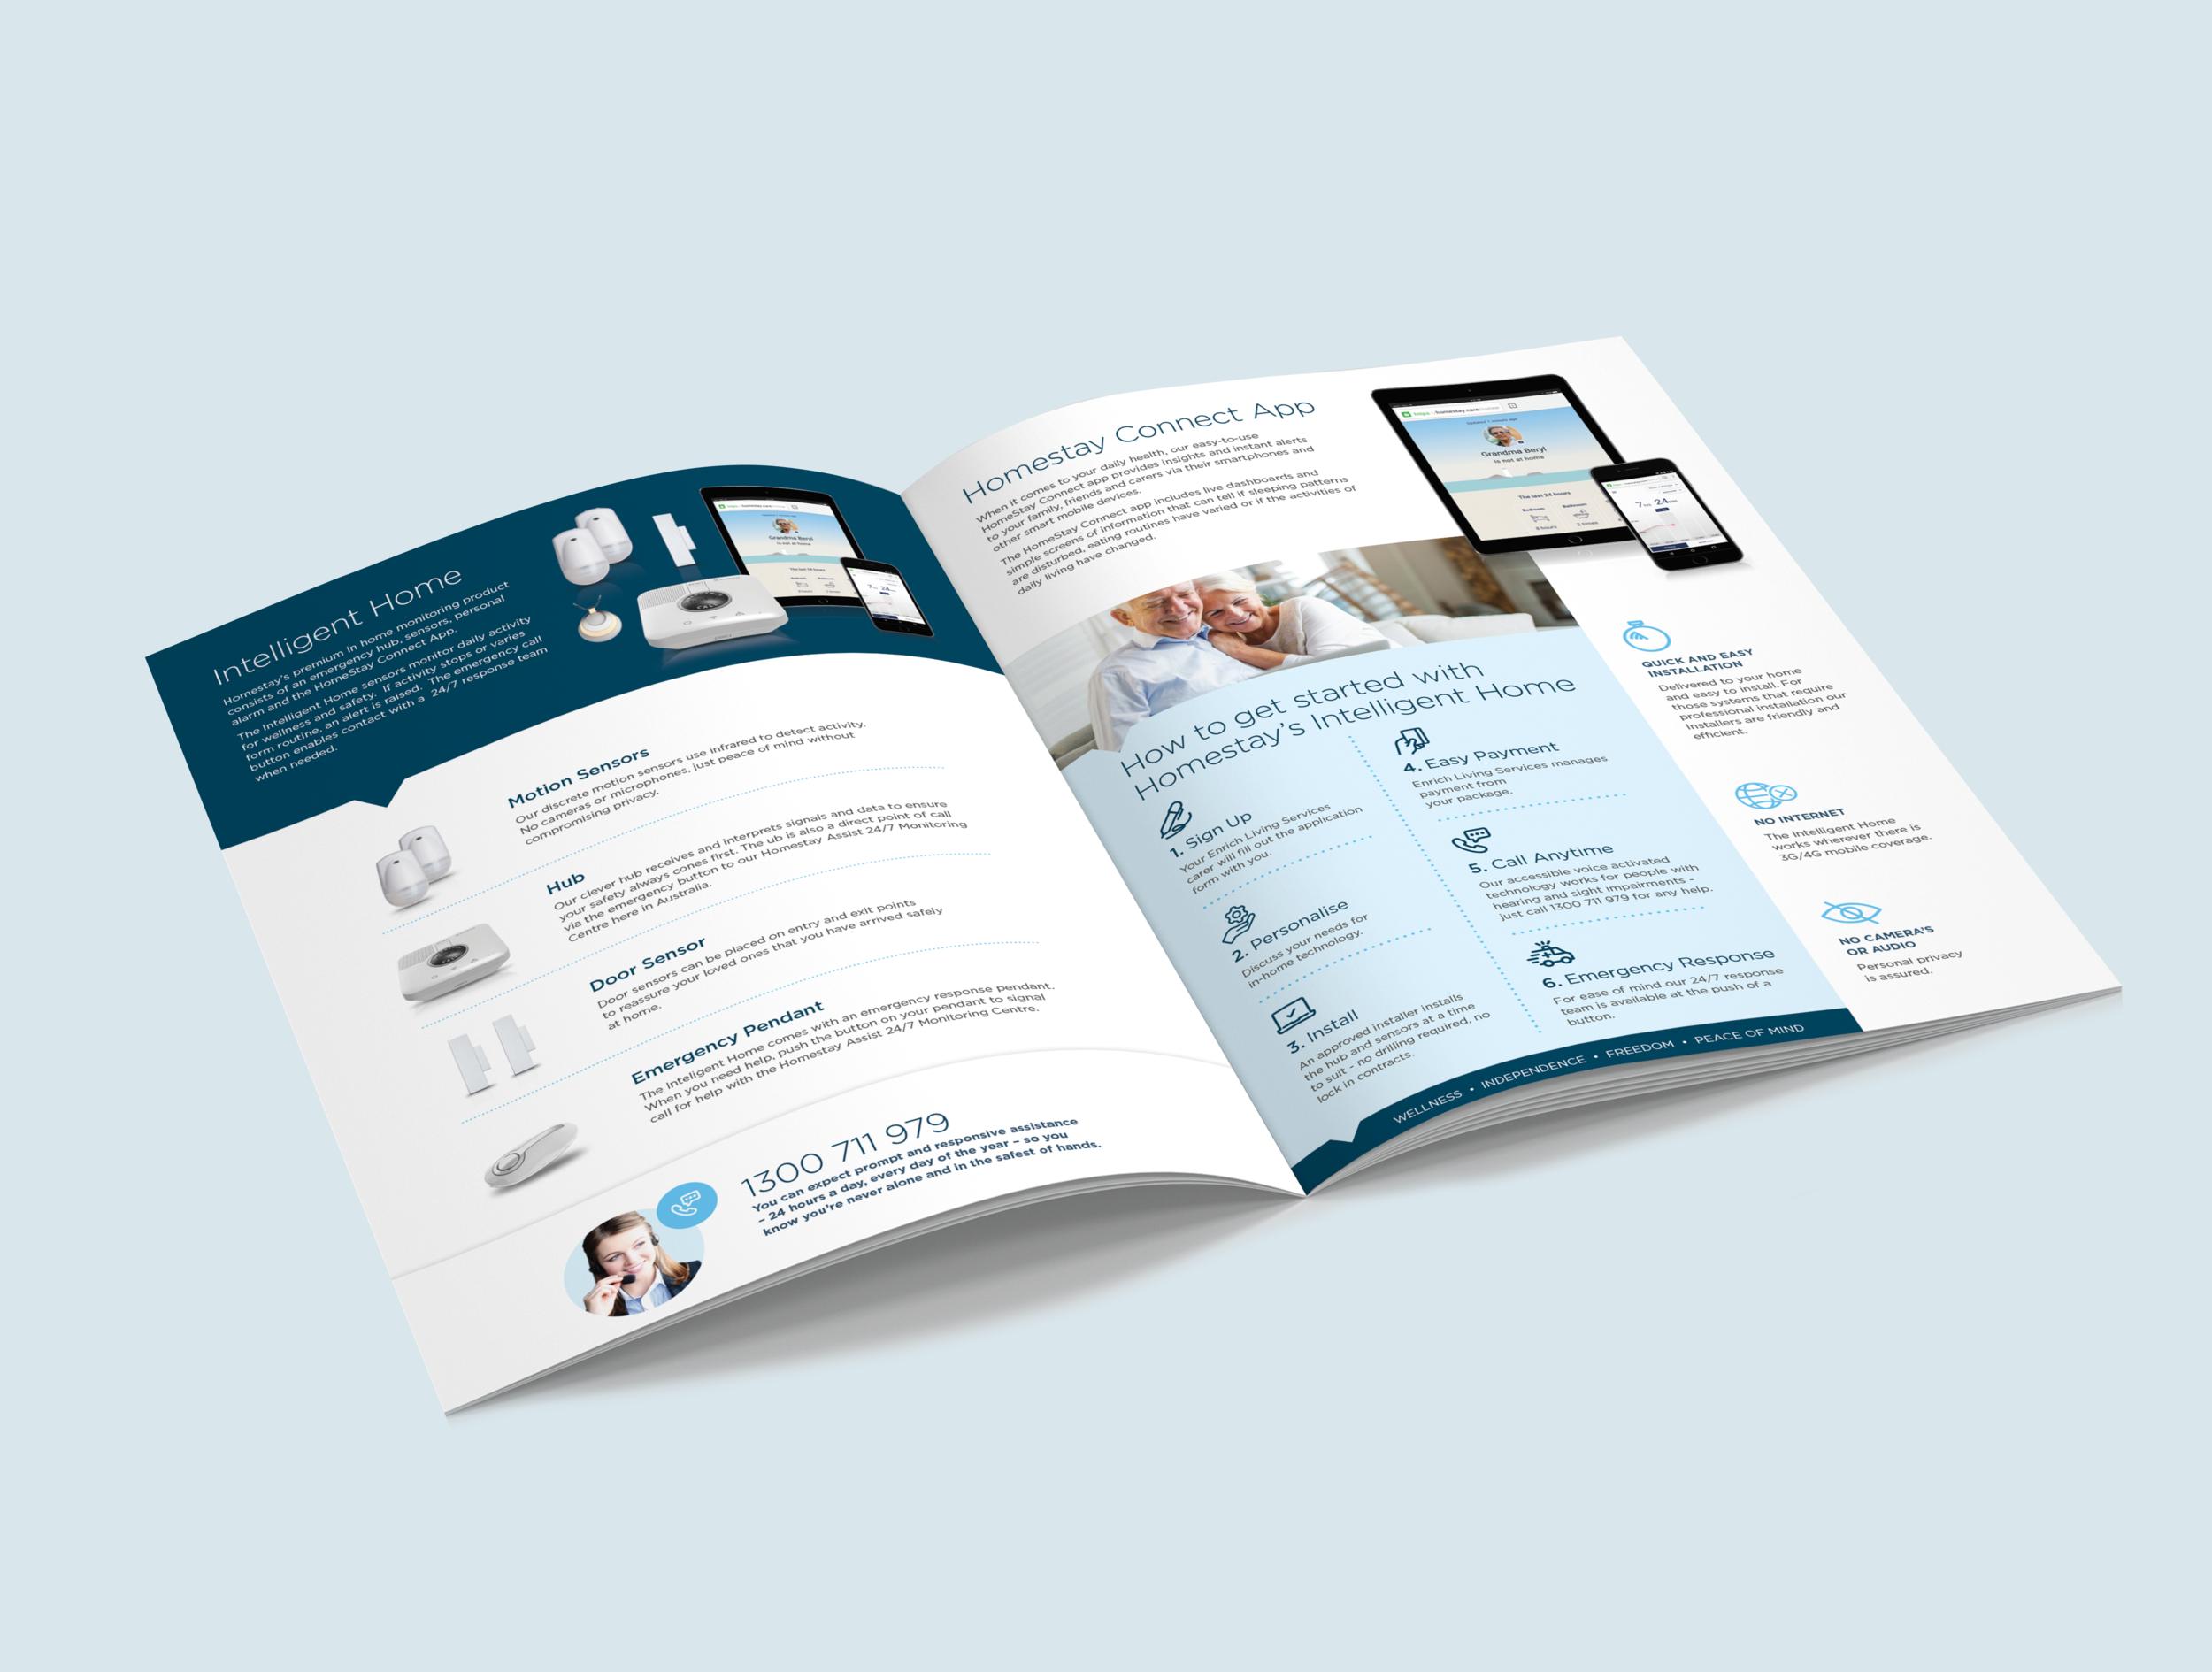 homestay-brochure-inside2.png